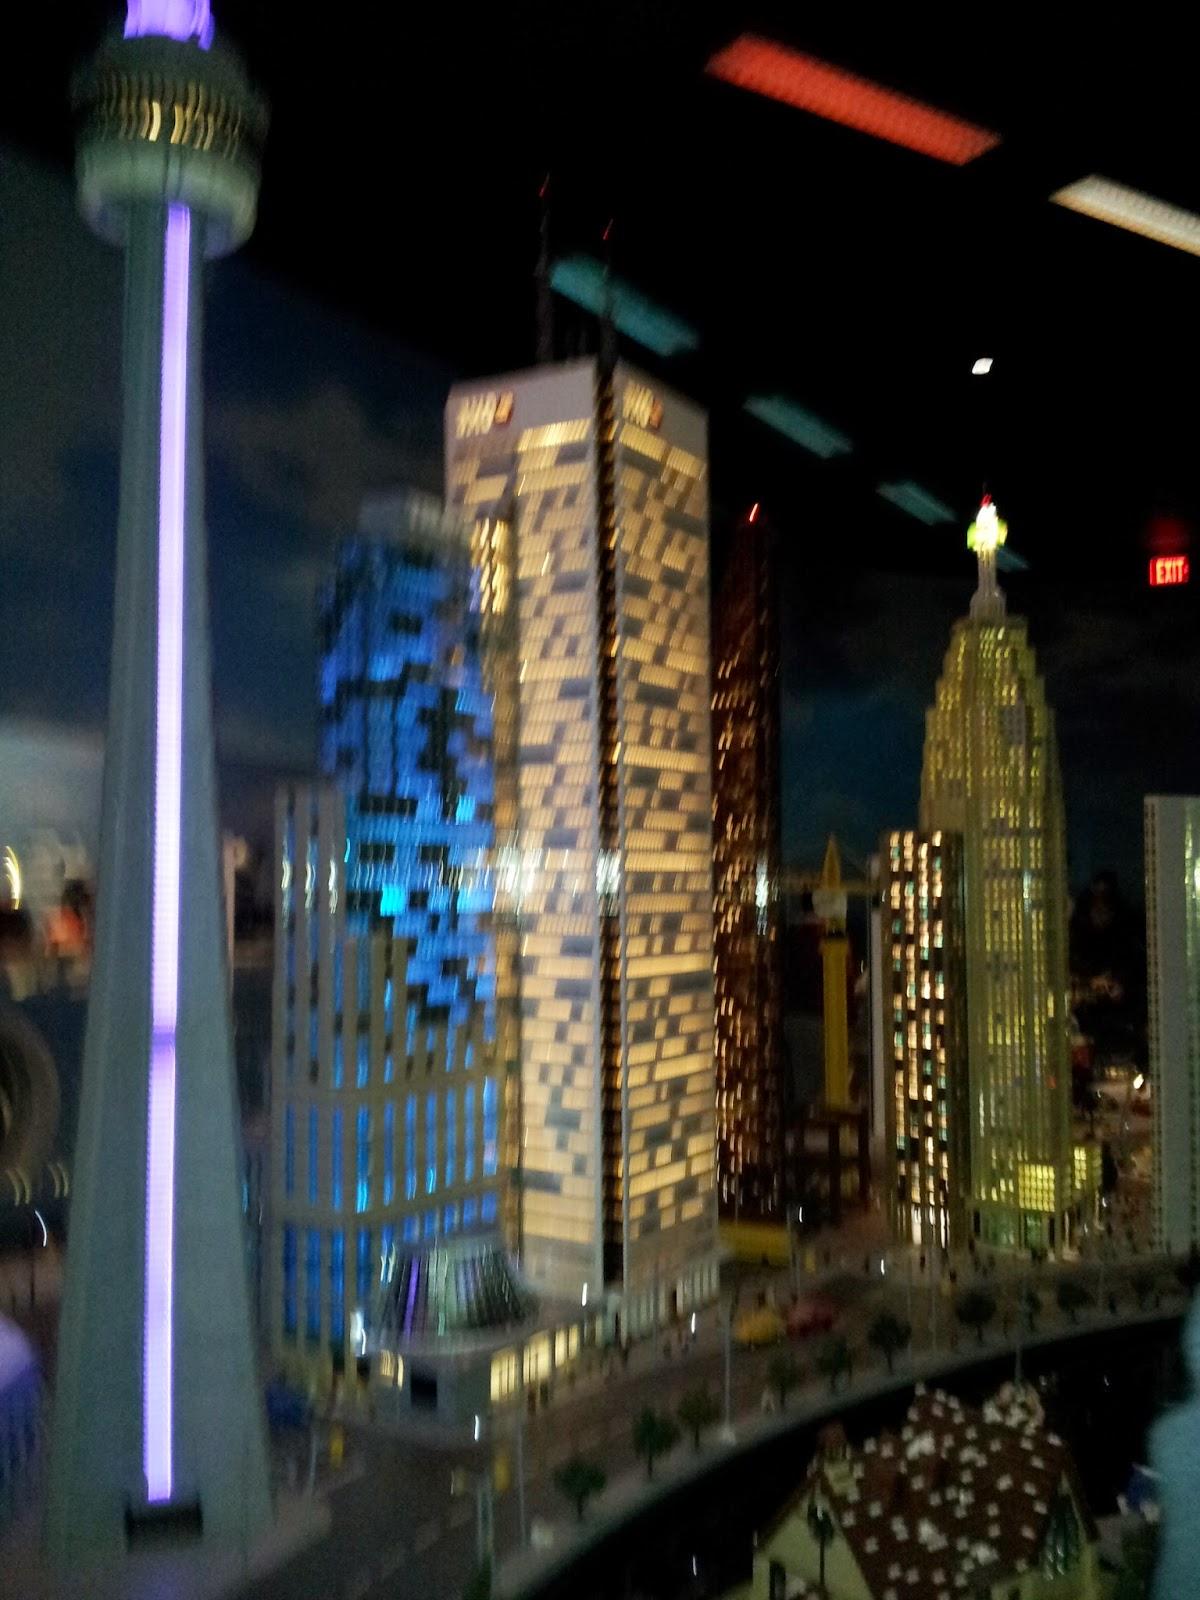 Legoland Miniland Toronto skyline, kids activities